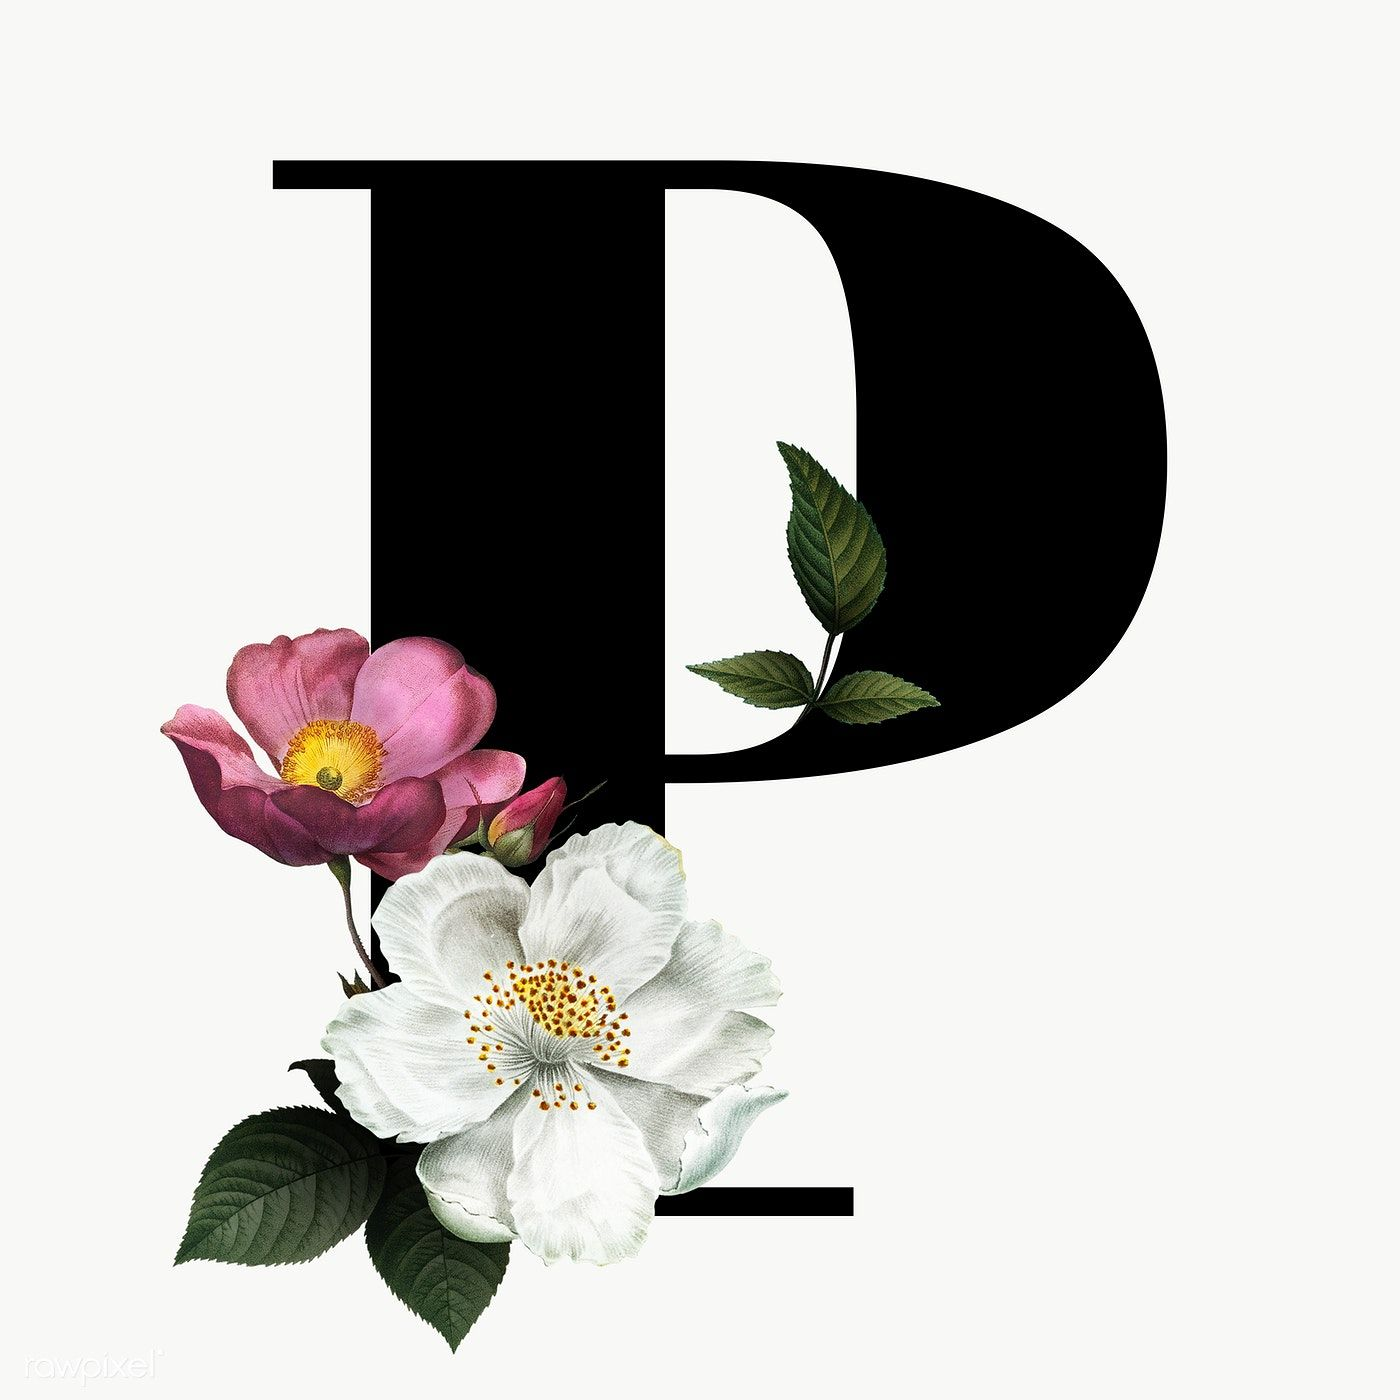 Classic And Elegant Floral Alphabet Font Letter P Transparent Png Free Image By Rawpixel Com Lettering Alphabet Fonts Fonts Alphabet Lettering Fonts